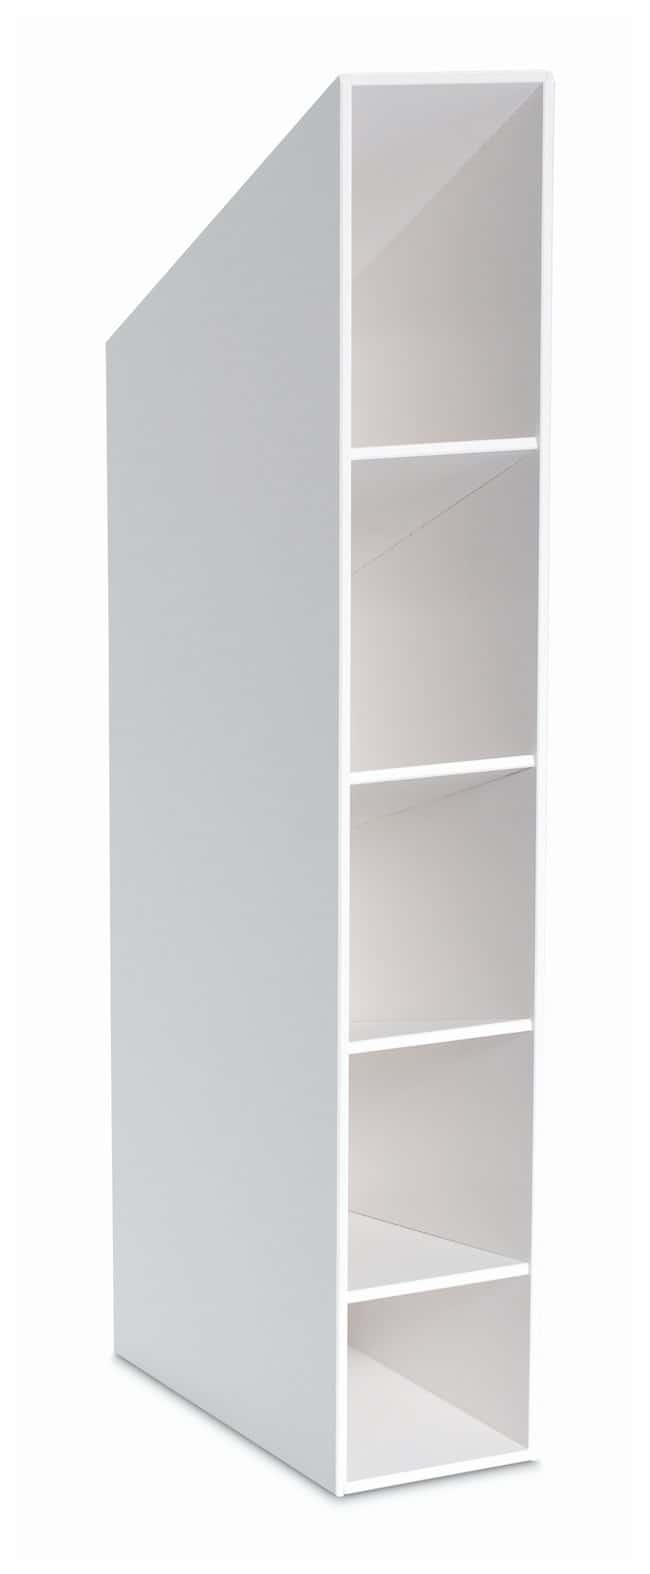 TrippNT Benchtop Acrylic Pipet Storage Bin Bench Top Pipet Storage 4 Bins :Racks,